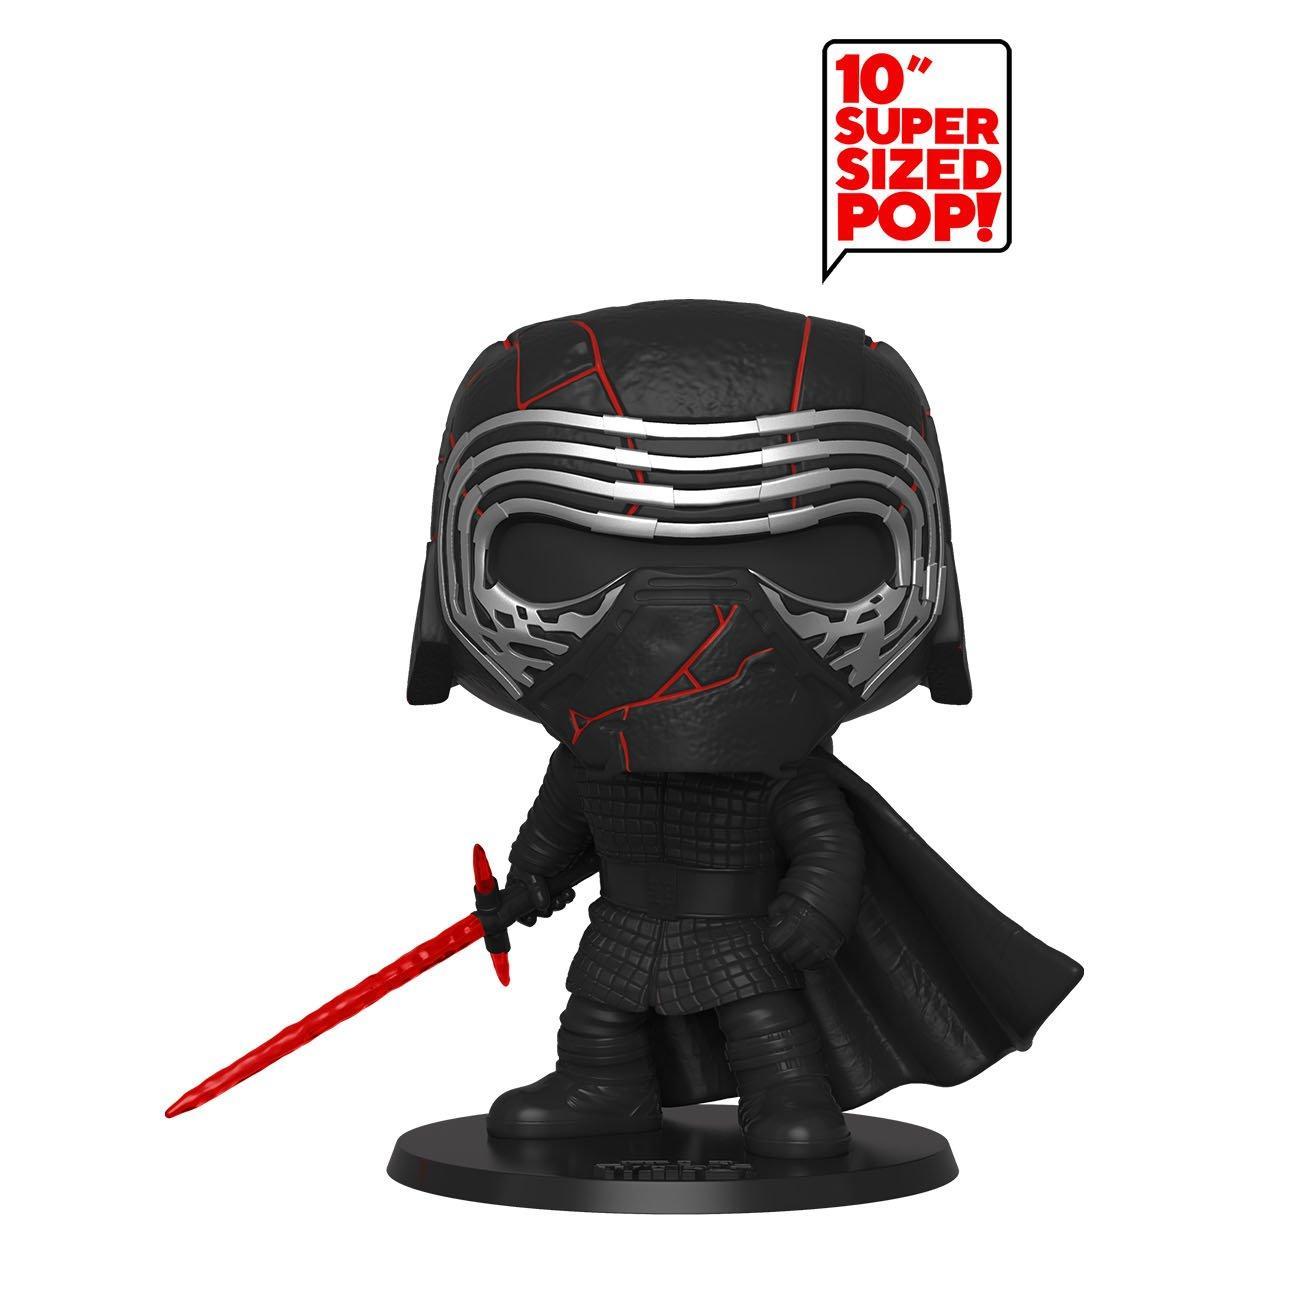 Vinyl Star Wars Kylo Ren Glow Episode IX Rise of Skywalker 10 Inch Pop FunK